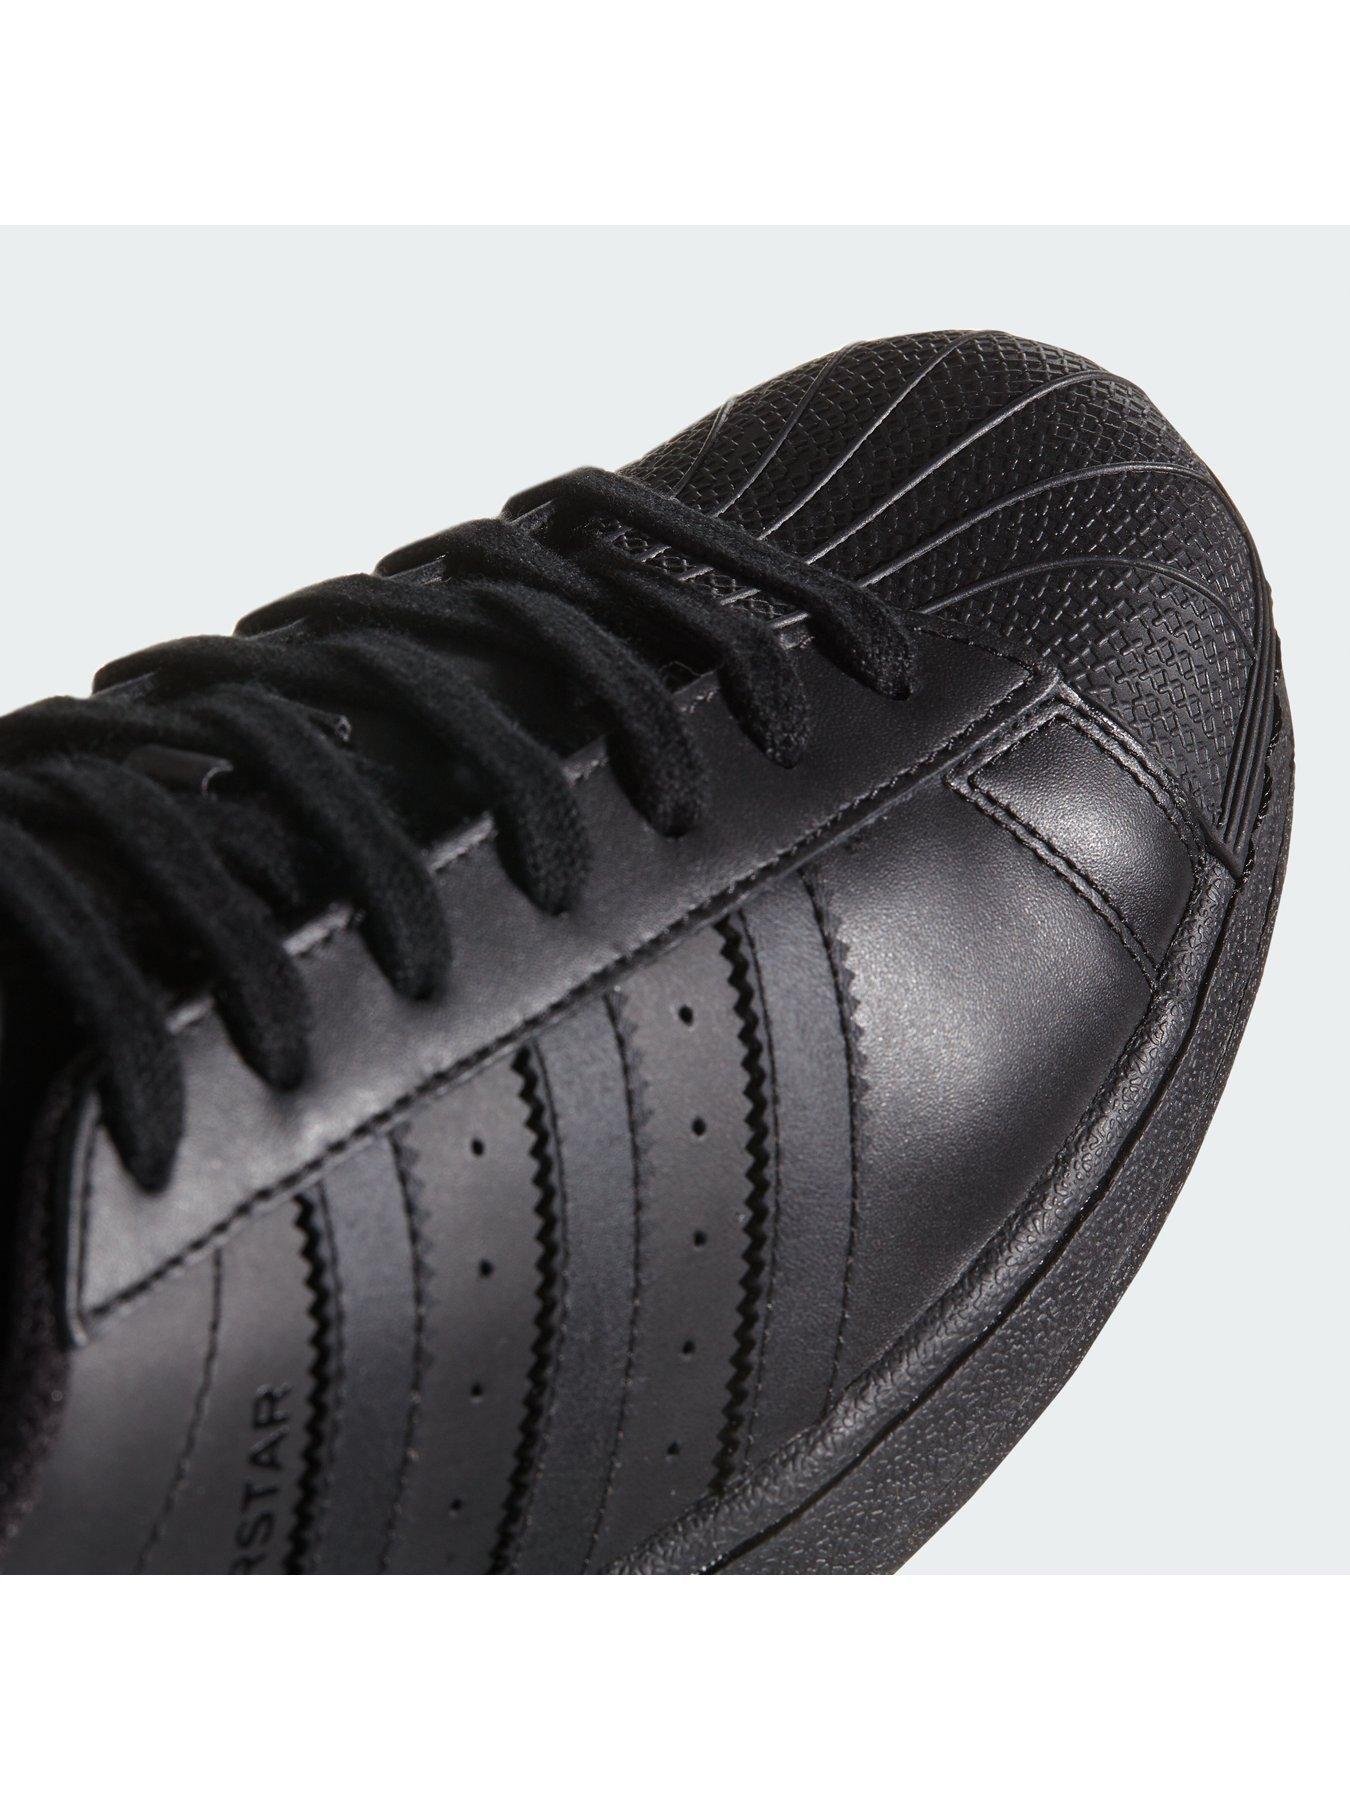 Adidas Originals Superstar Foundation Trainers Black